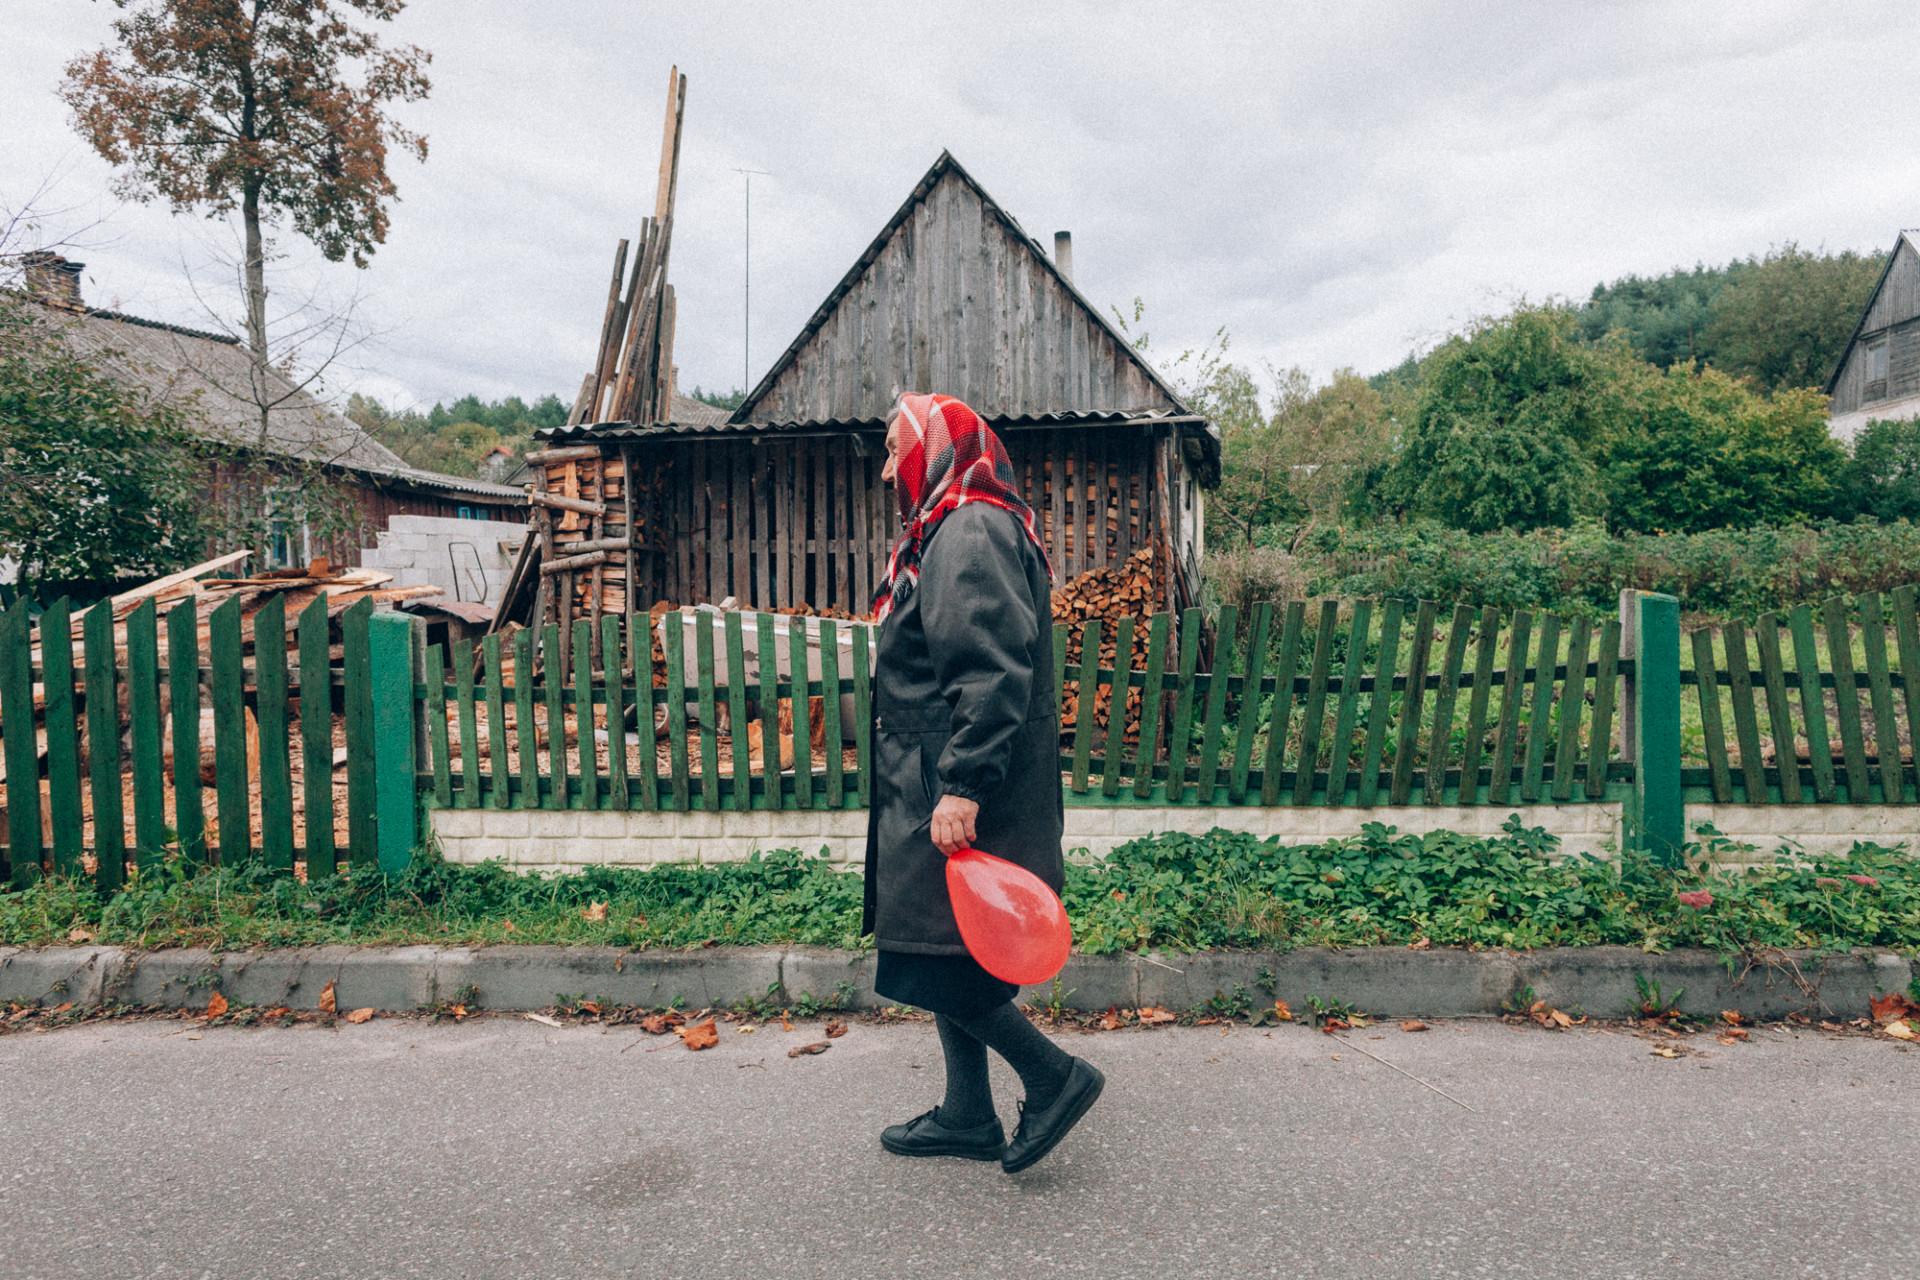 JANNIS KEIL Film & Foto #7